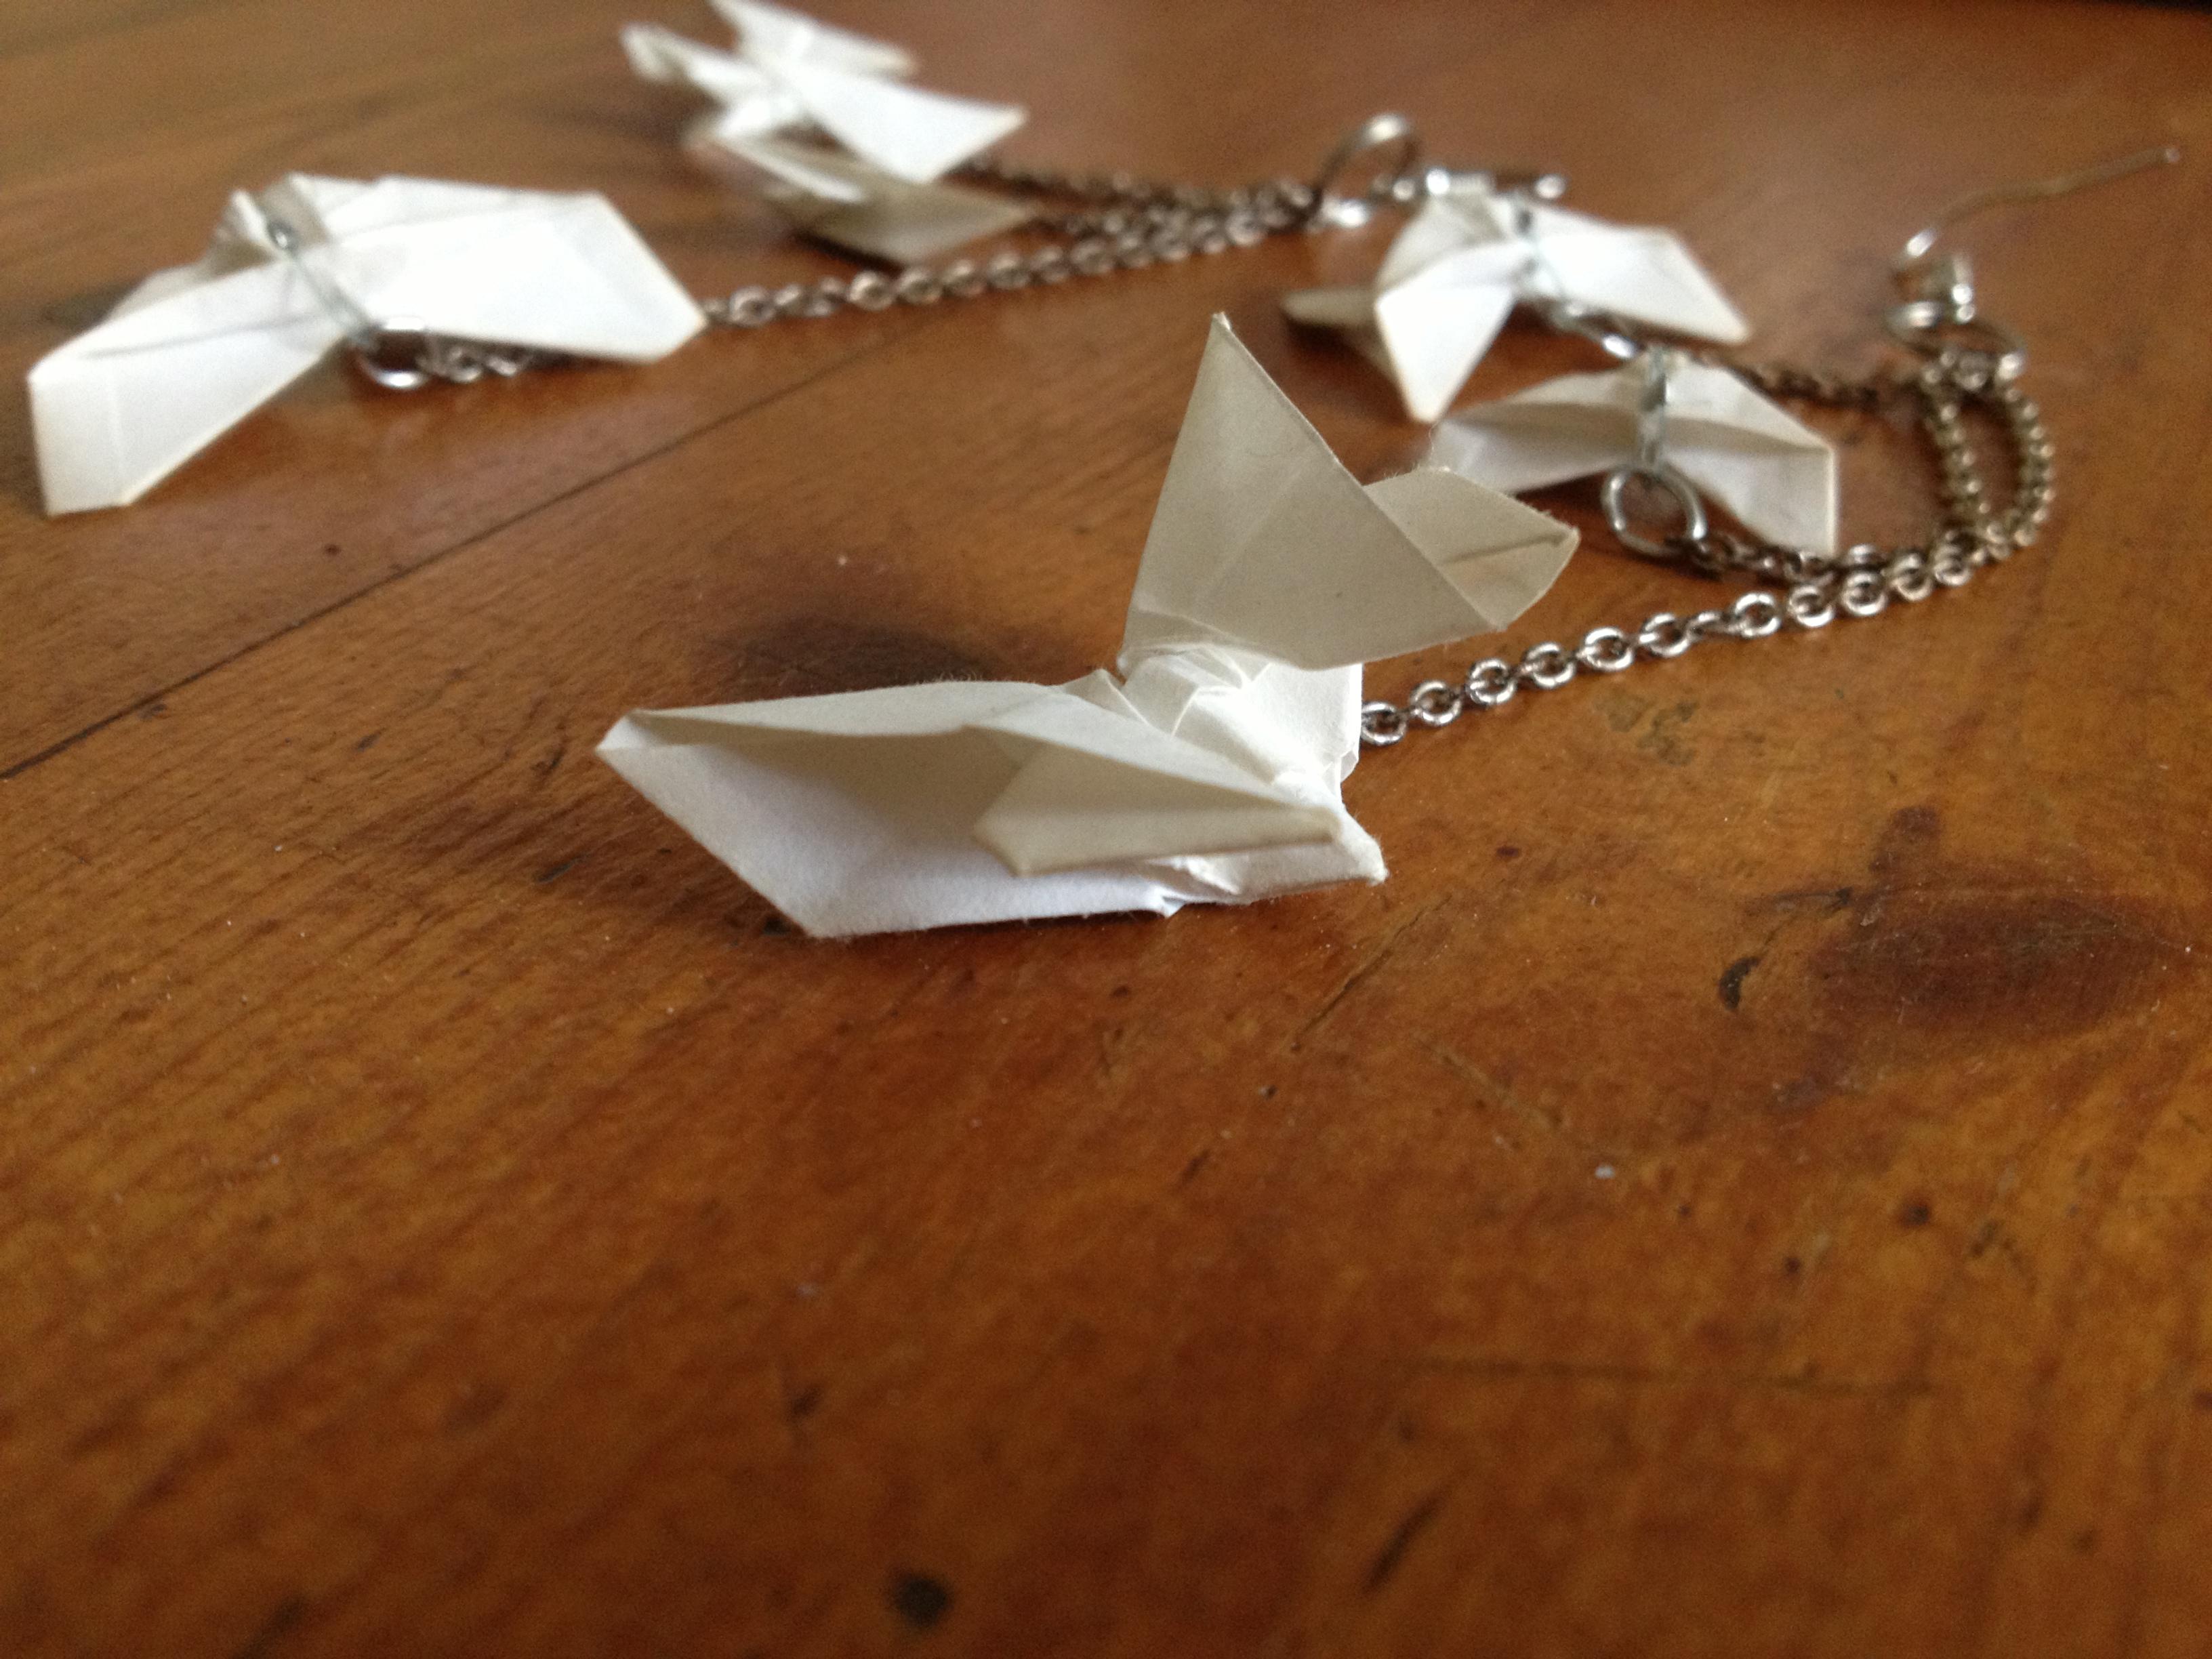 diy les boucles d oreilles origami it 39 s her mess. Black Bedroom Furniture Sets. Home Design Ideas